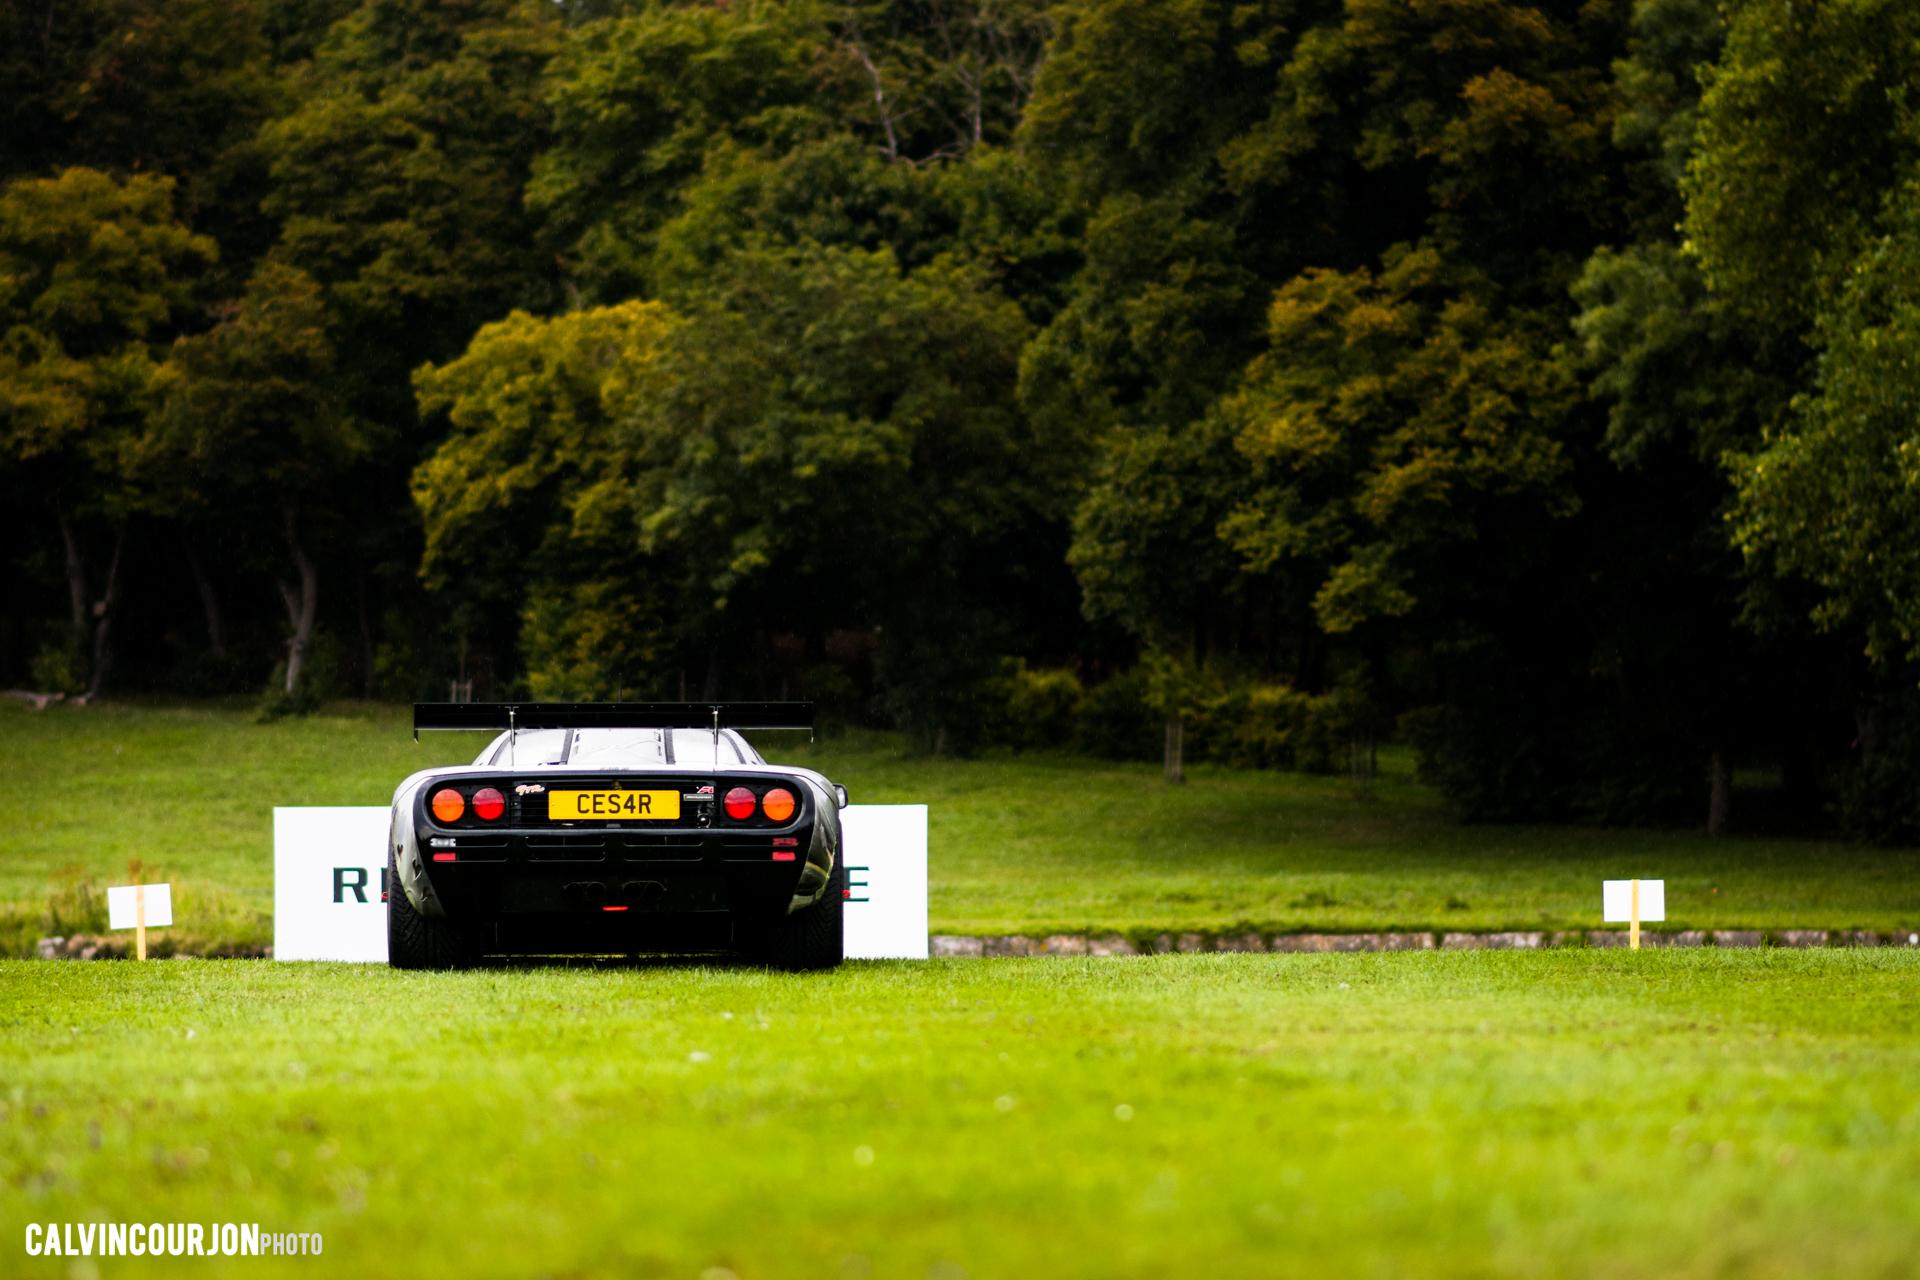 McLaren F1 (1995) – Cesar - rear far away / arrière de loin – Chantilly 2015 – photo Calvin Courjon